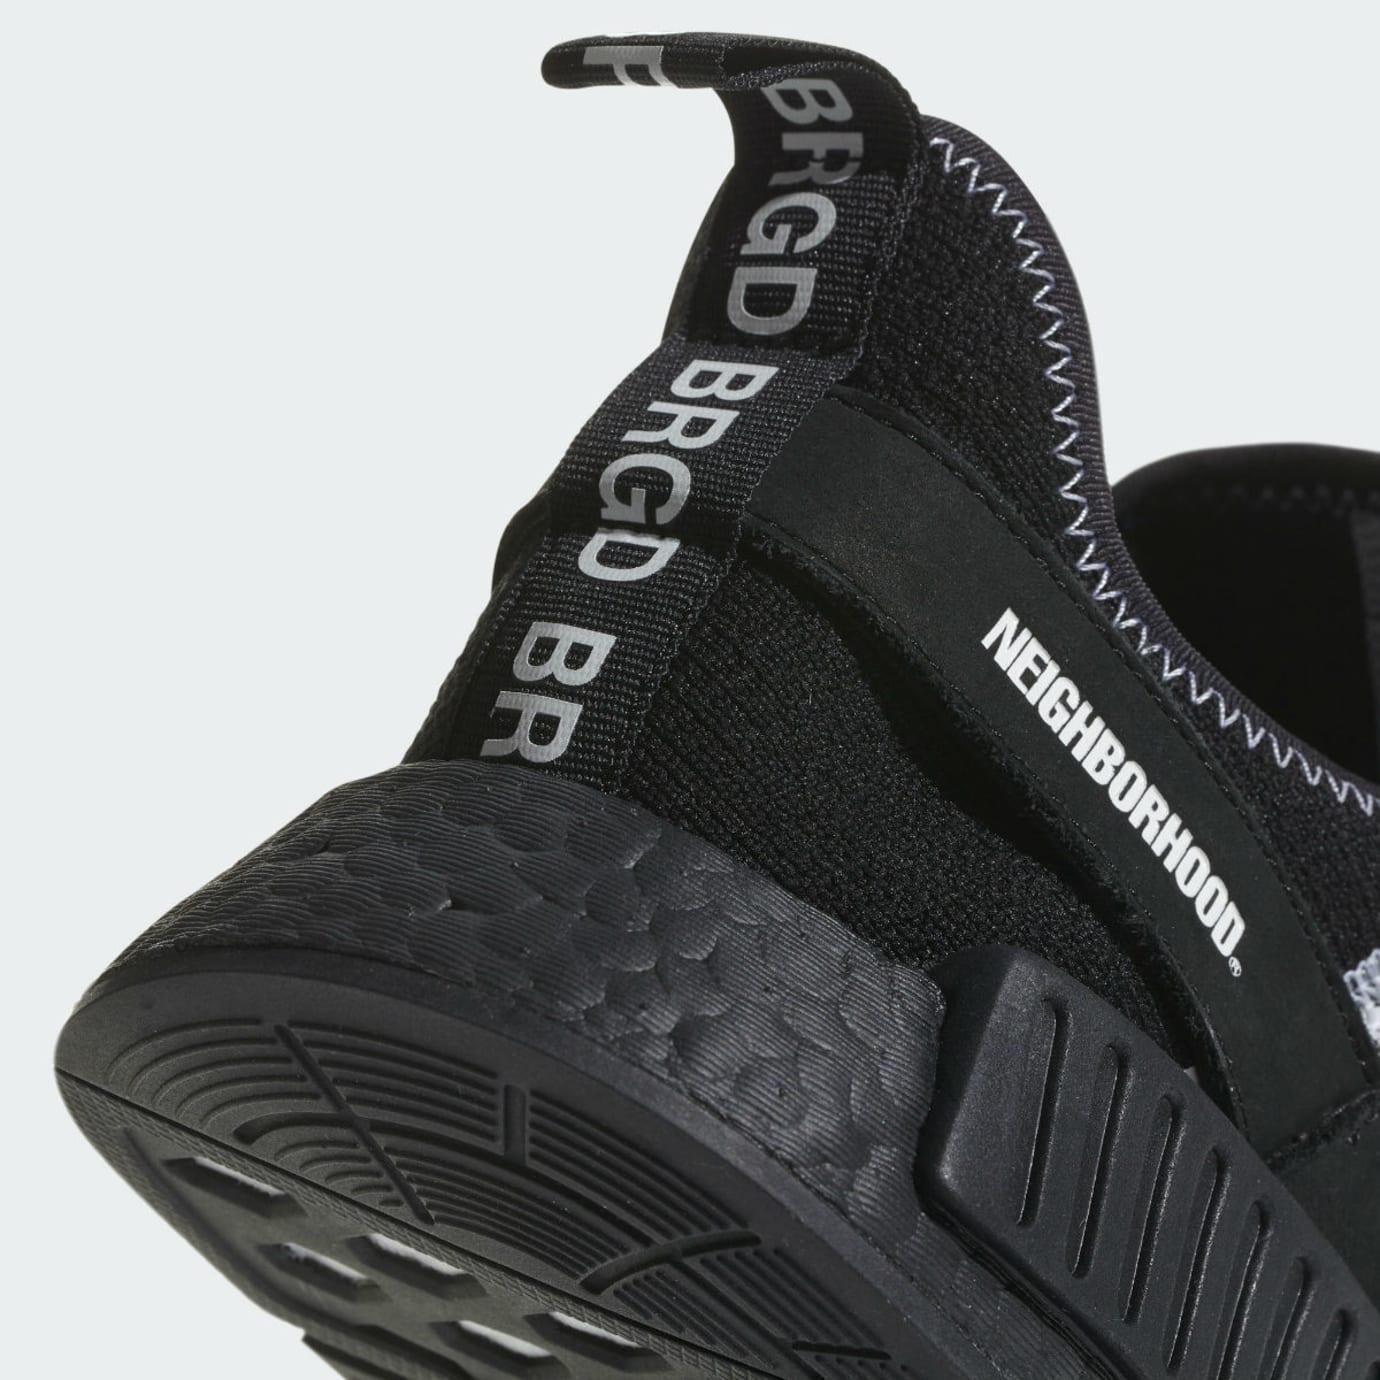 new arrival bdf88 96a9d Neighborhood x Adidas NMD R1 Release Date DA8835 | Sole ...